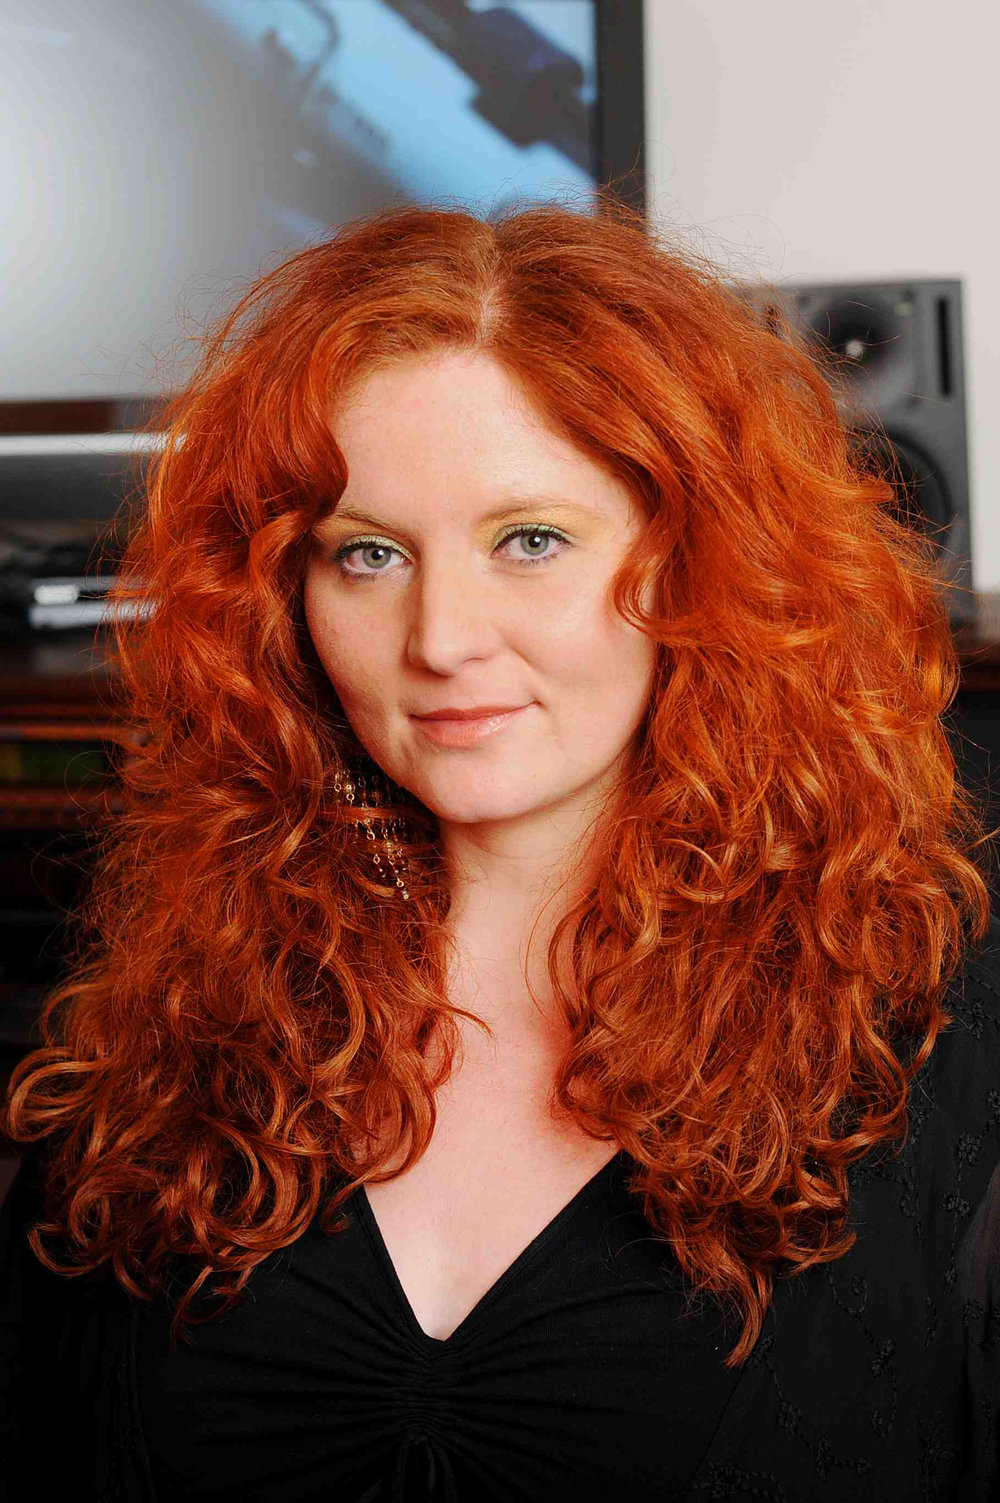 Martina Eisenreich (Portrait), Fotograpy by  Yakup Zeyrek  [3,3 MB]